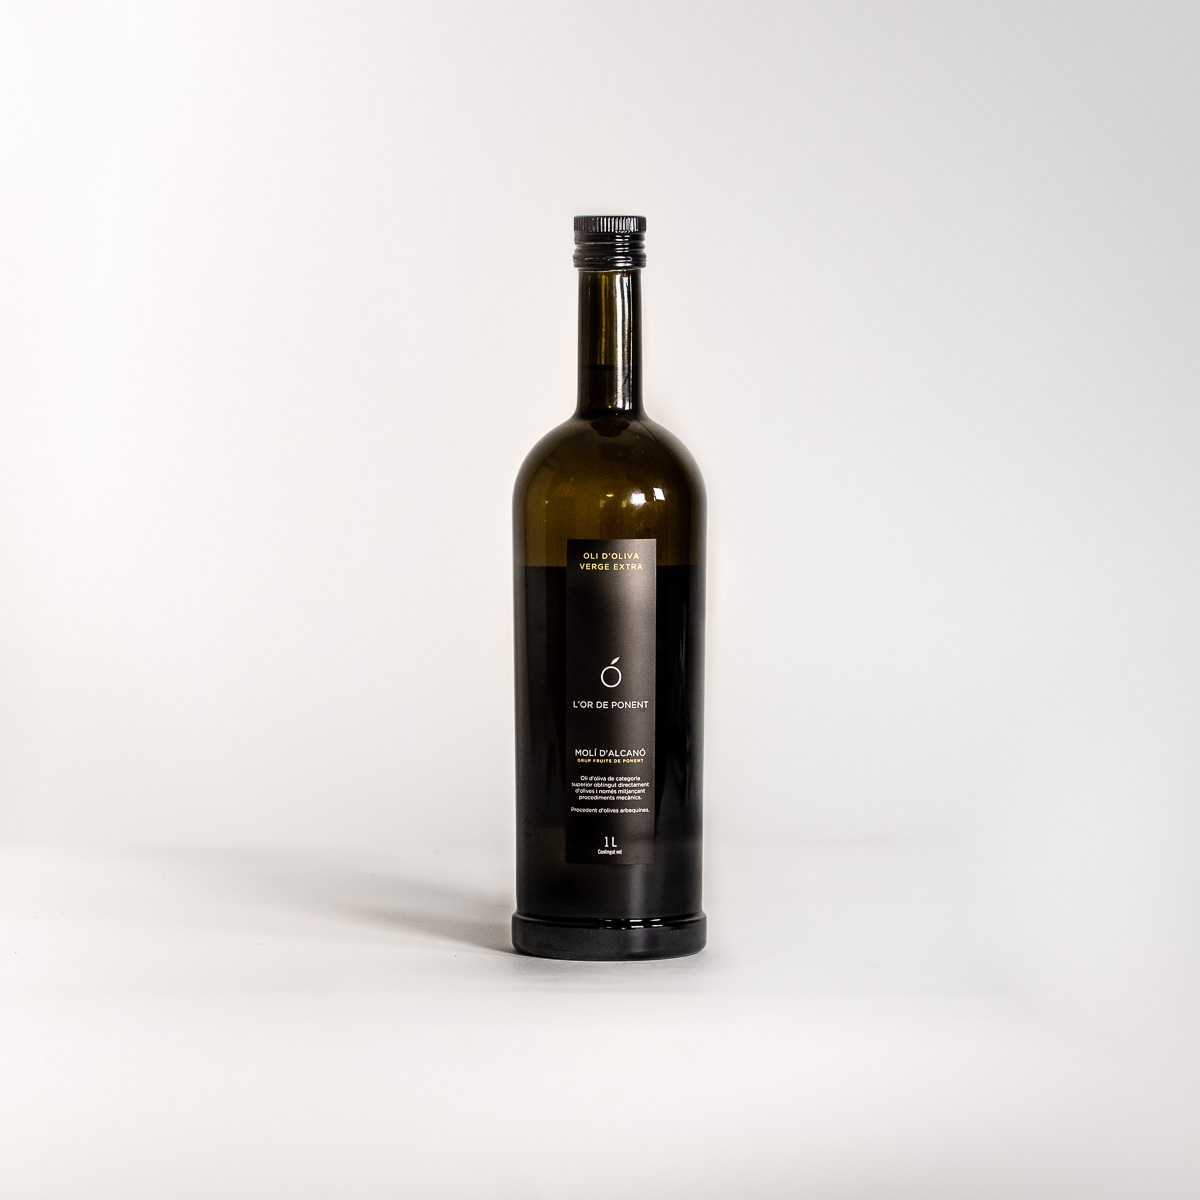 1 L-Or-de-Ponent-aove-aceite-oliva-virgen-extra-garrigues-denominacion-origen-1